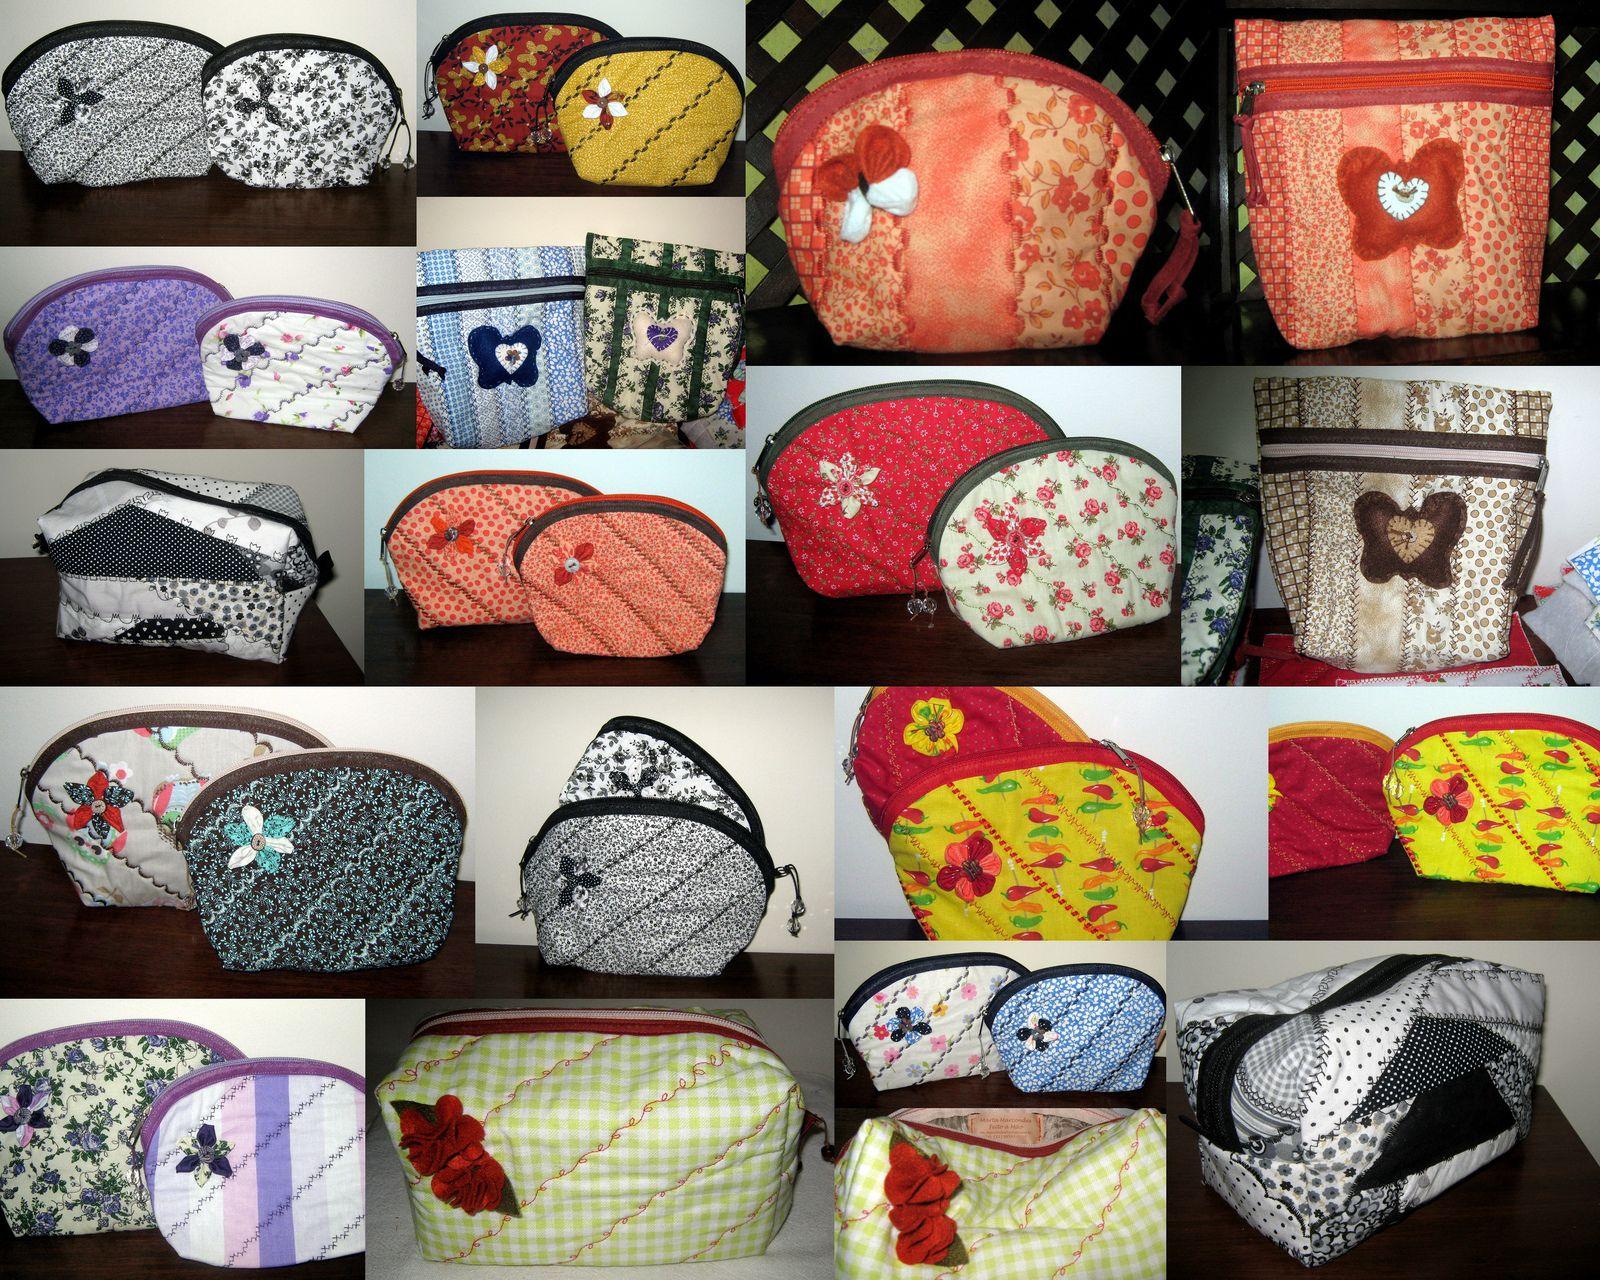 Necessaires e Organizadores confeccionadas por Marta Marcondes Artesanato em Tecidos